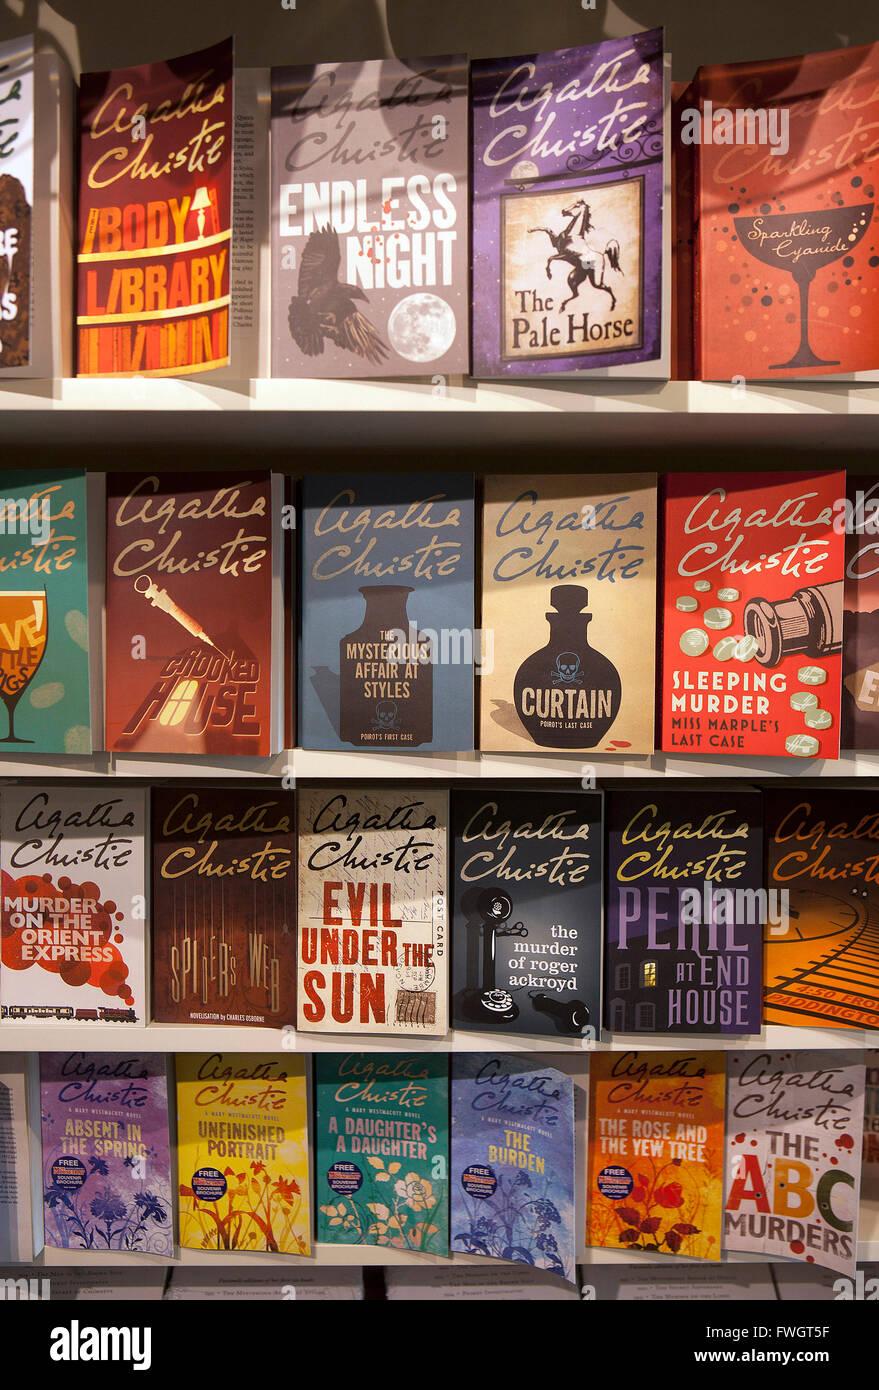 Agatha Christie's Torquay - Stock Image